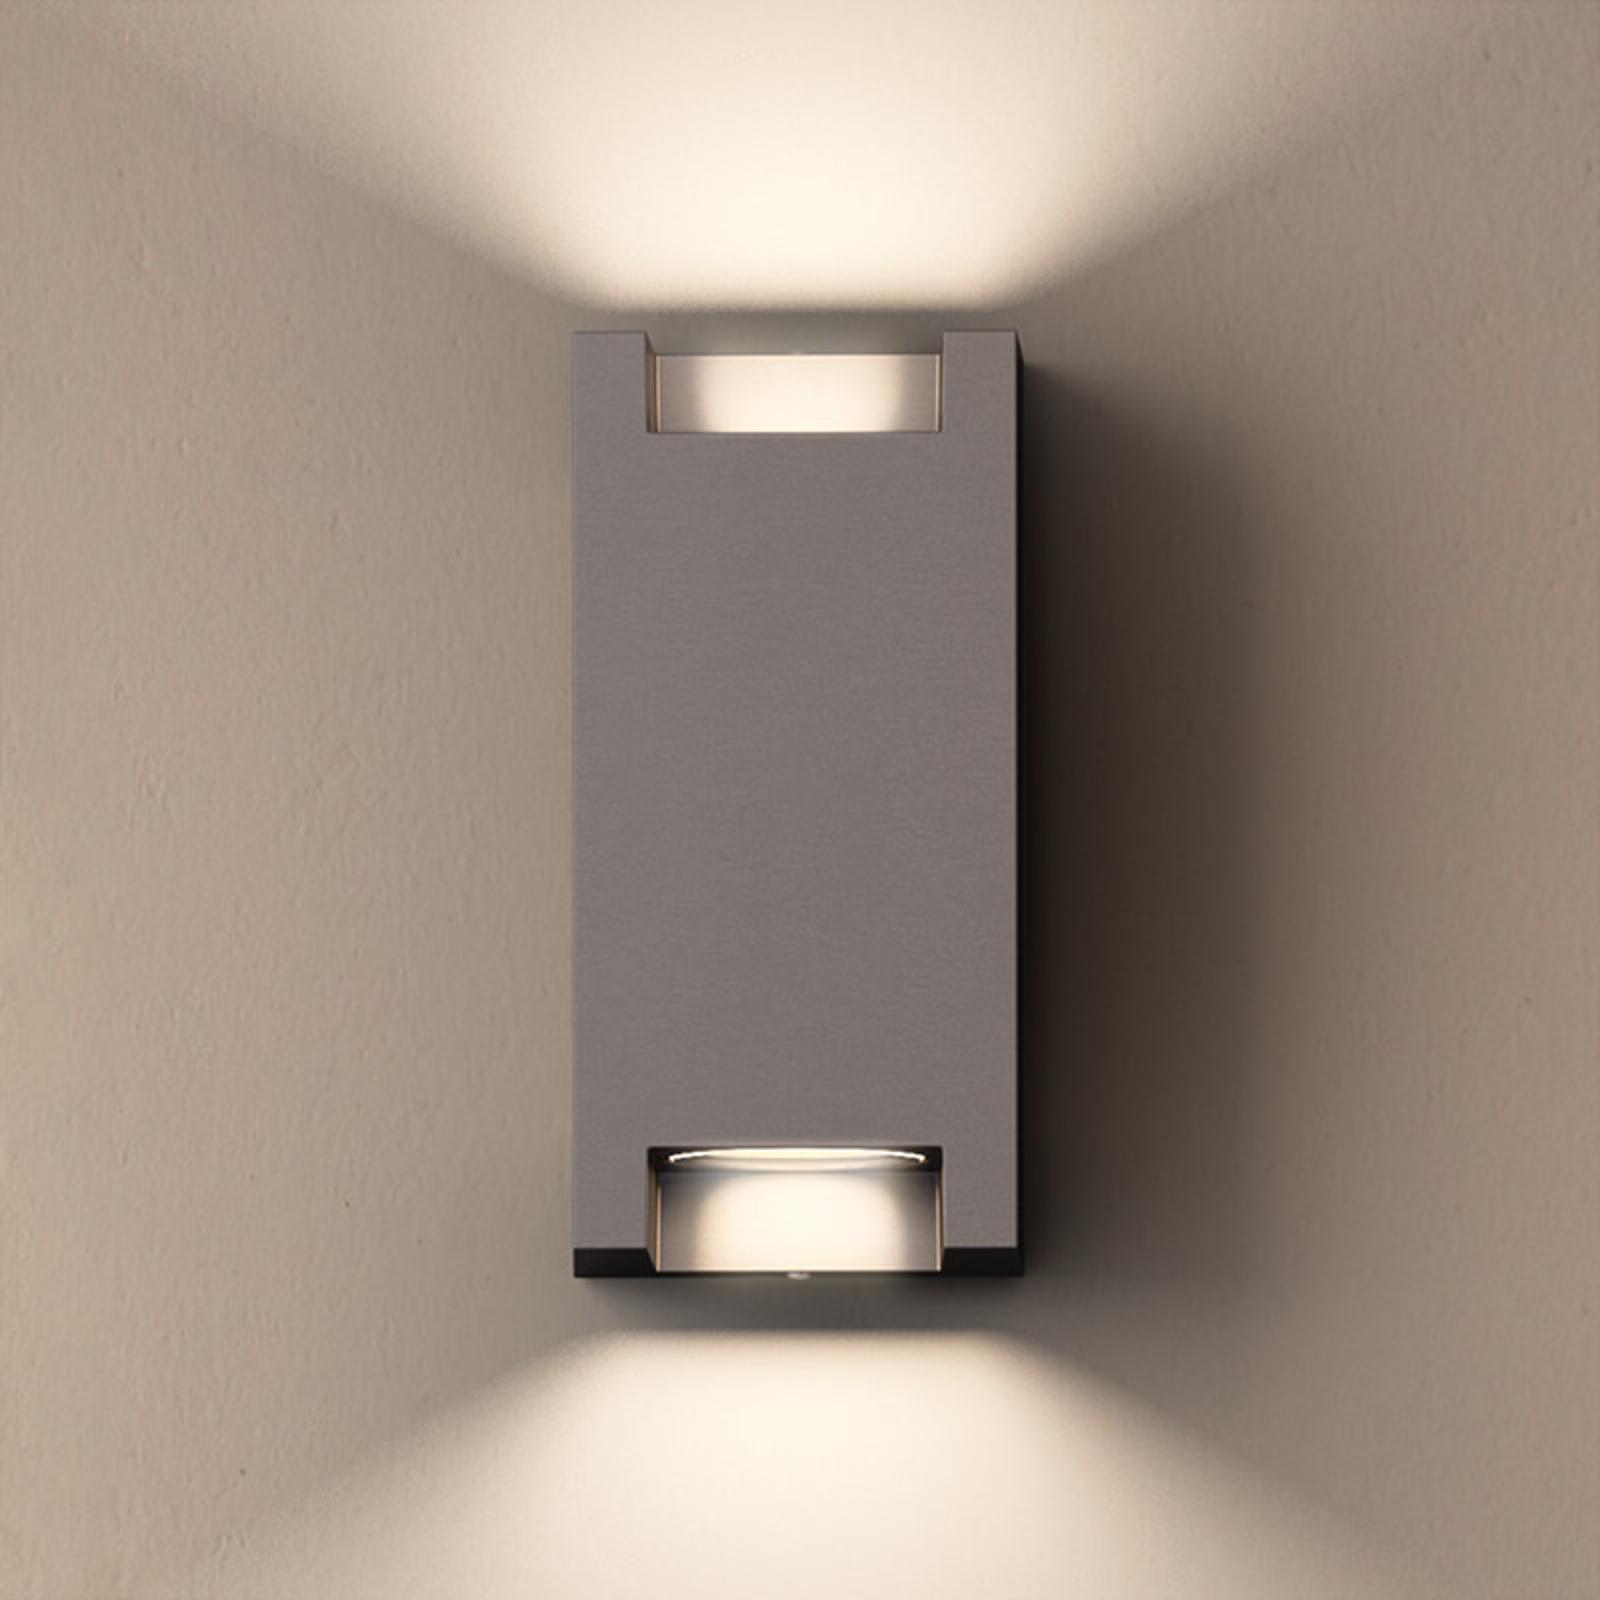 Philips nástěnná lampa myGarden Trowel